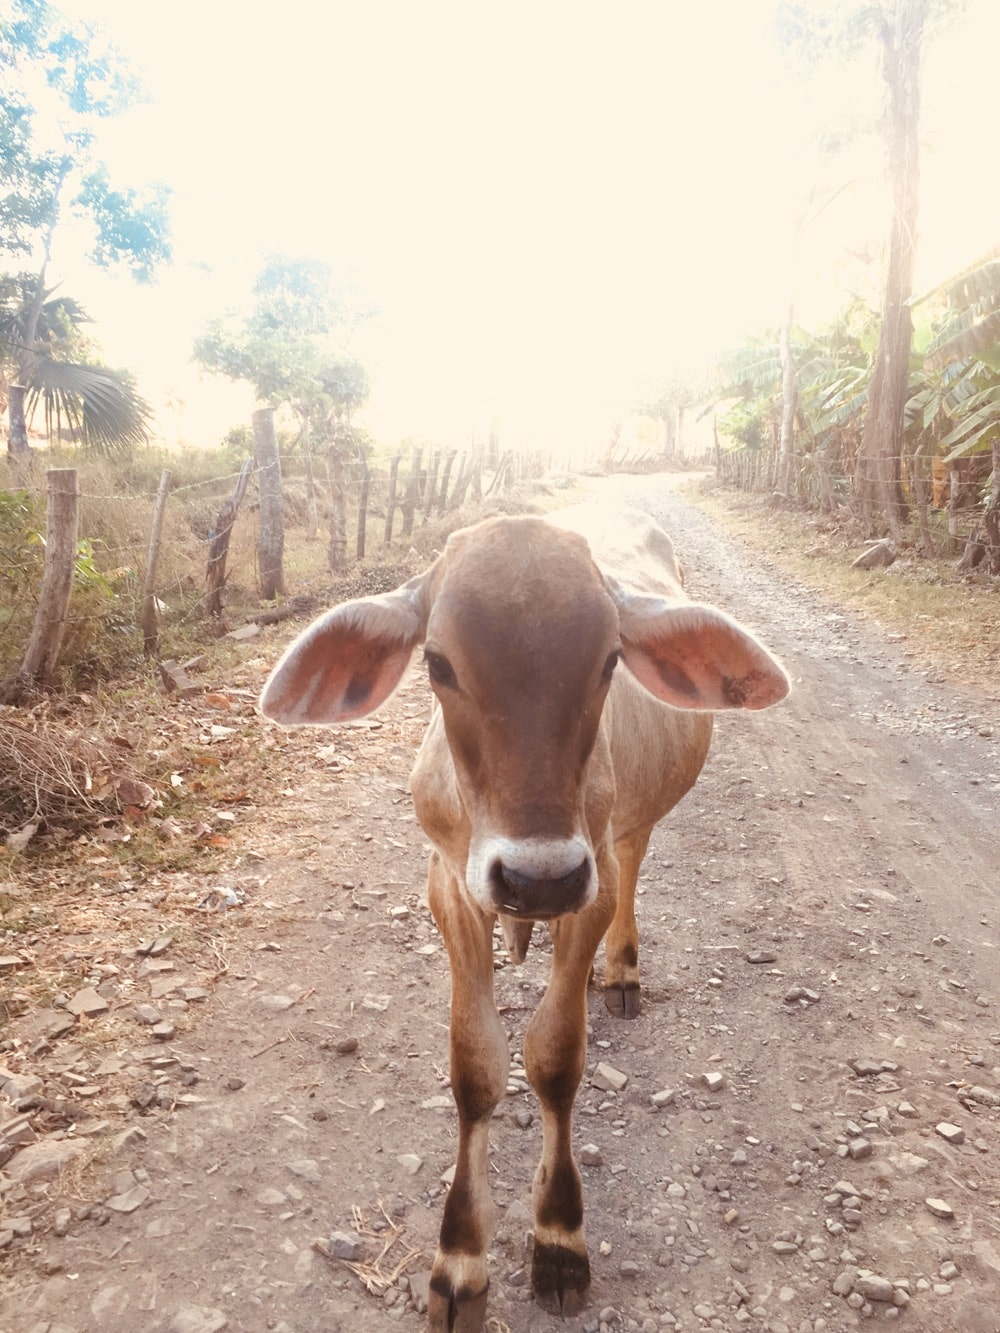 Hot local Nicaragua